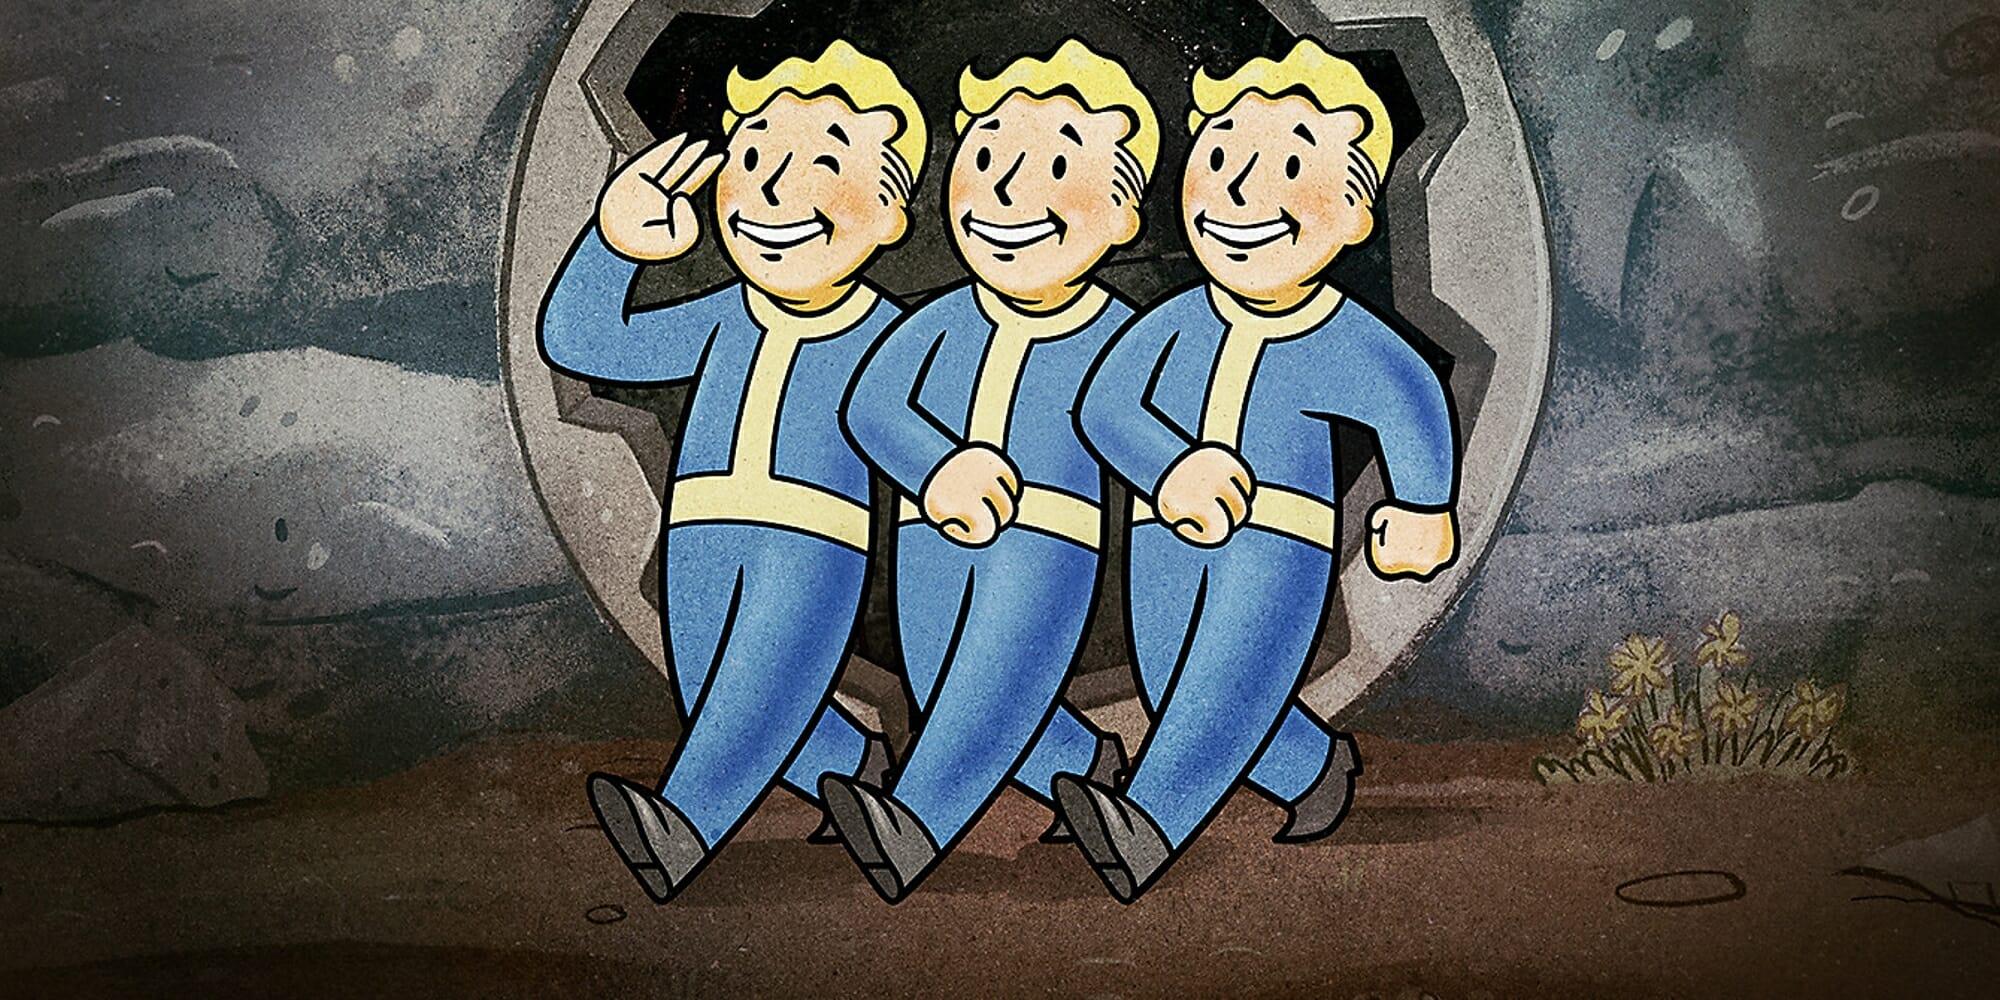 Amazon ще прави телевизионни серии по Fallout